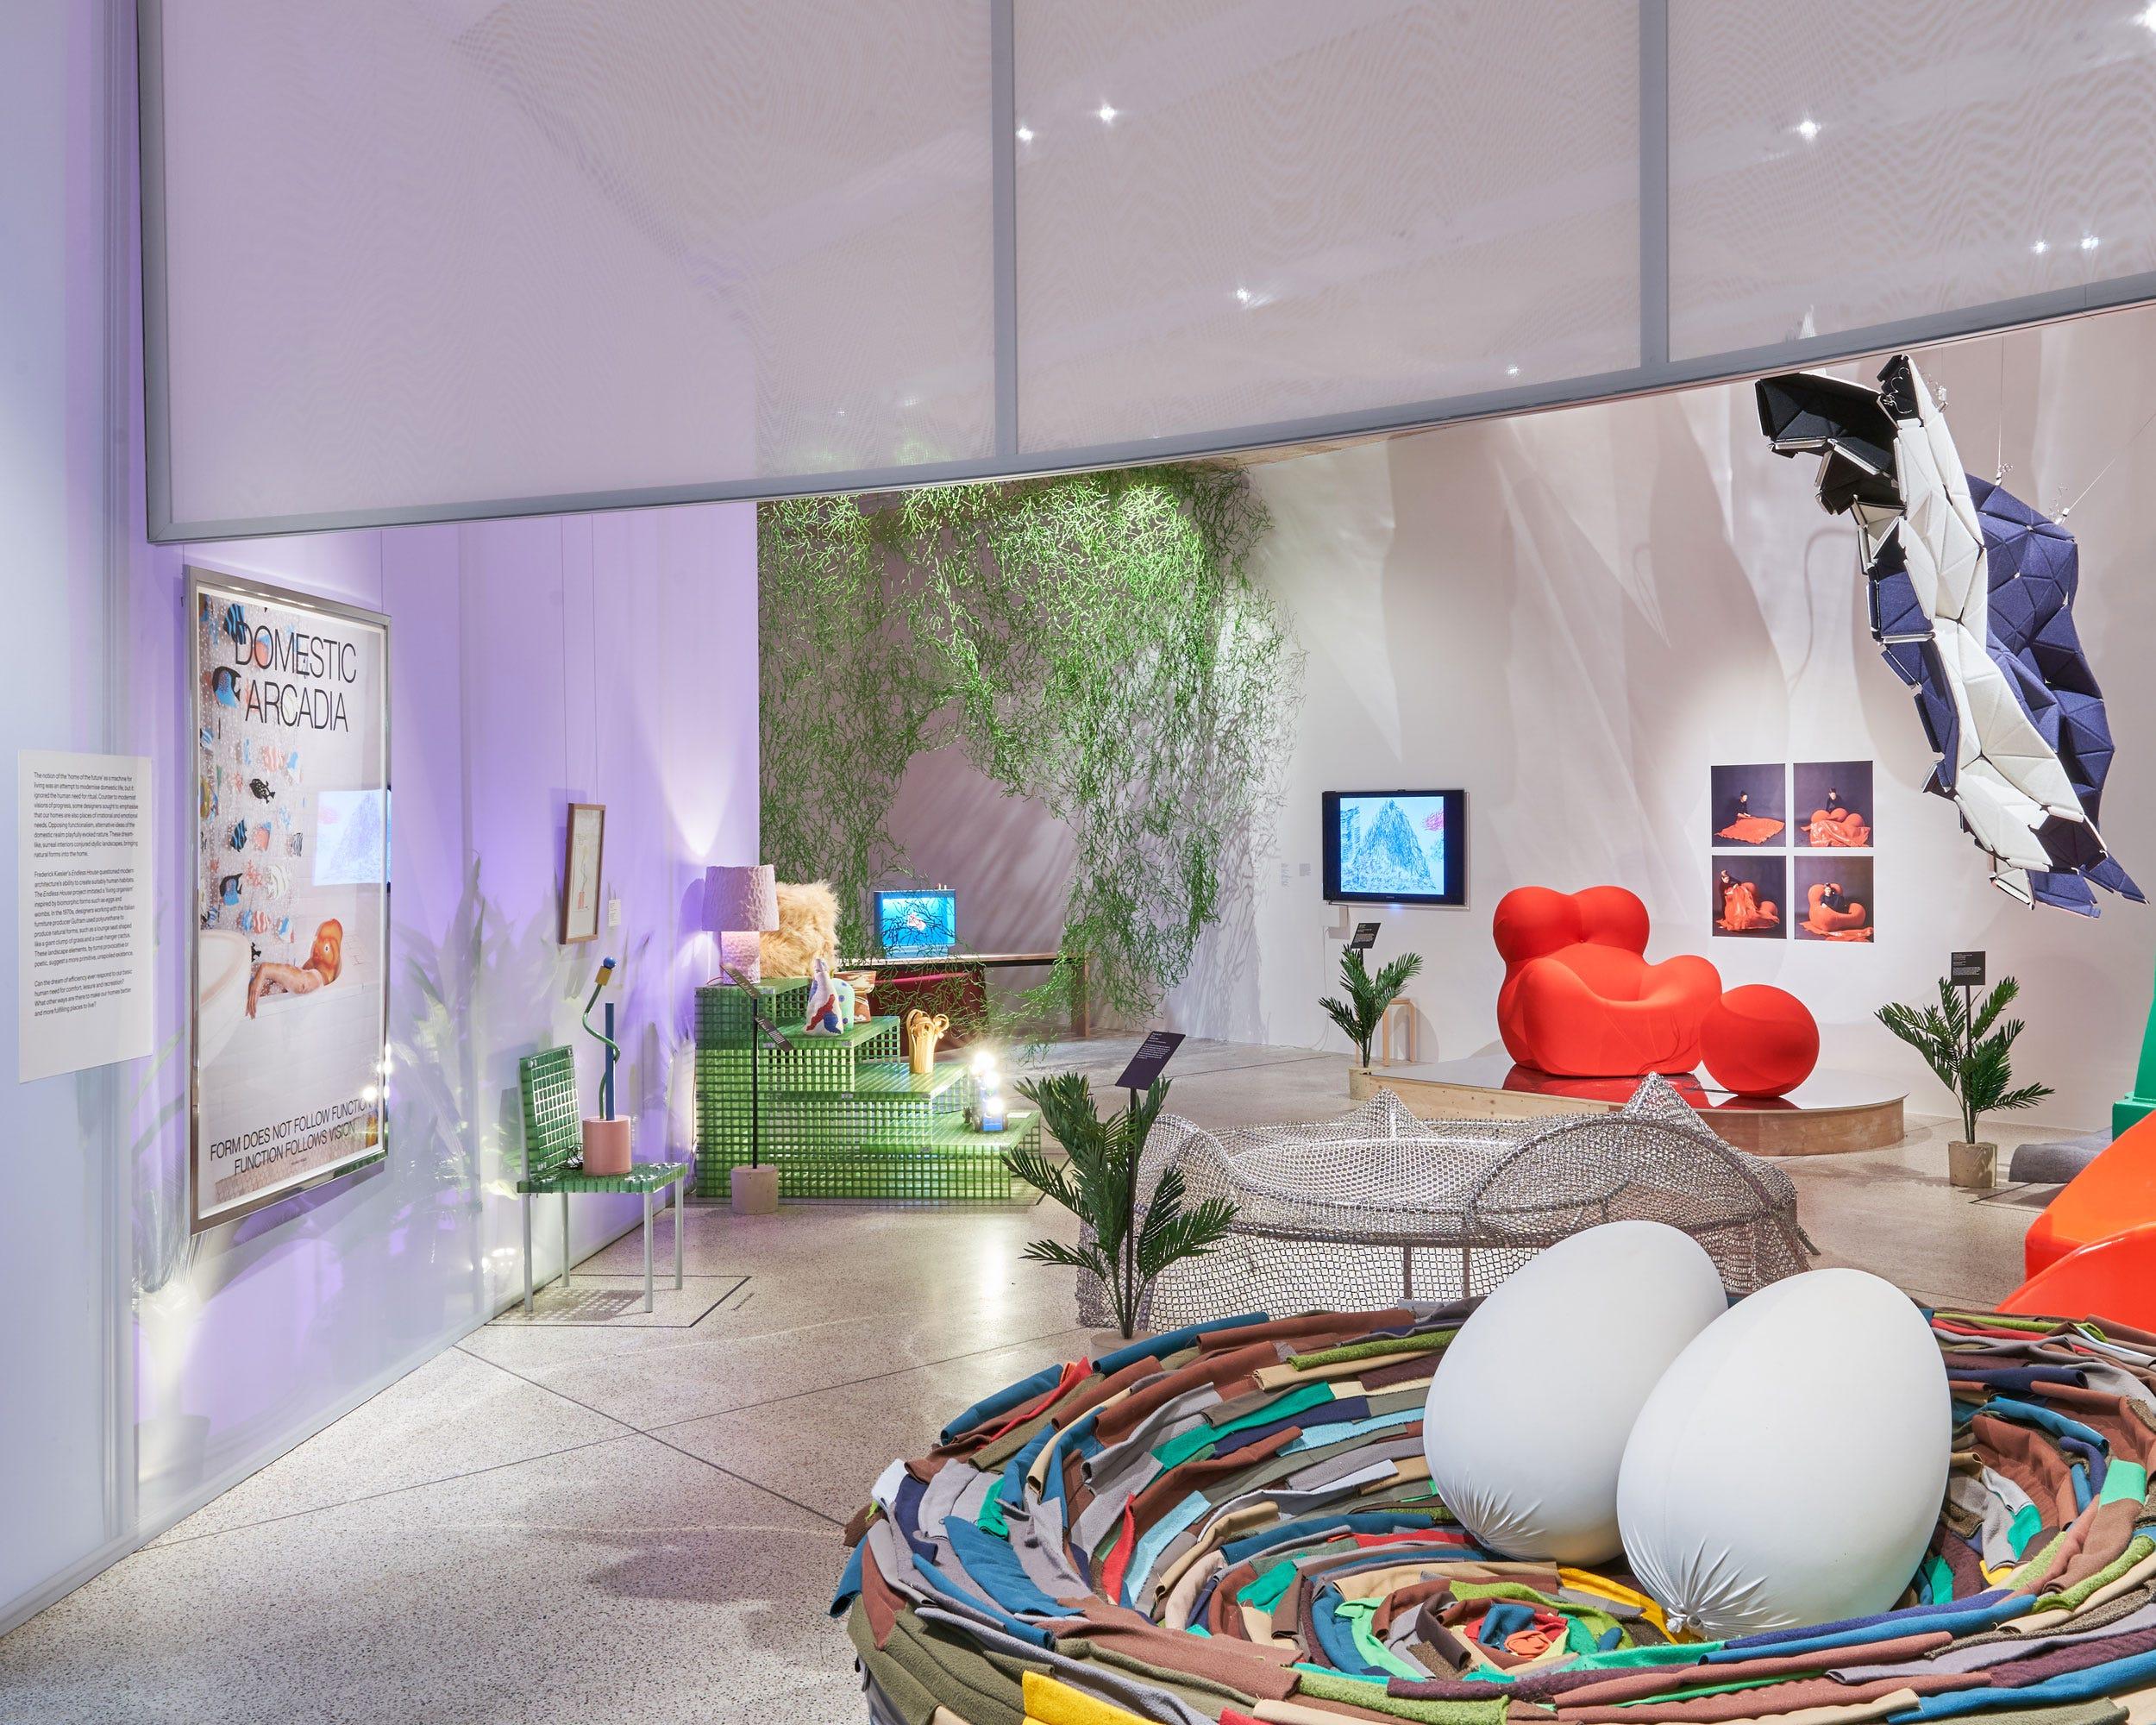 Ikea home predicting future living situations